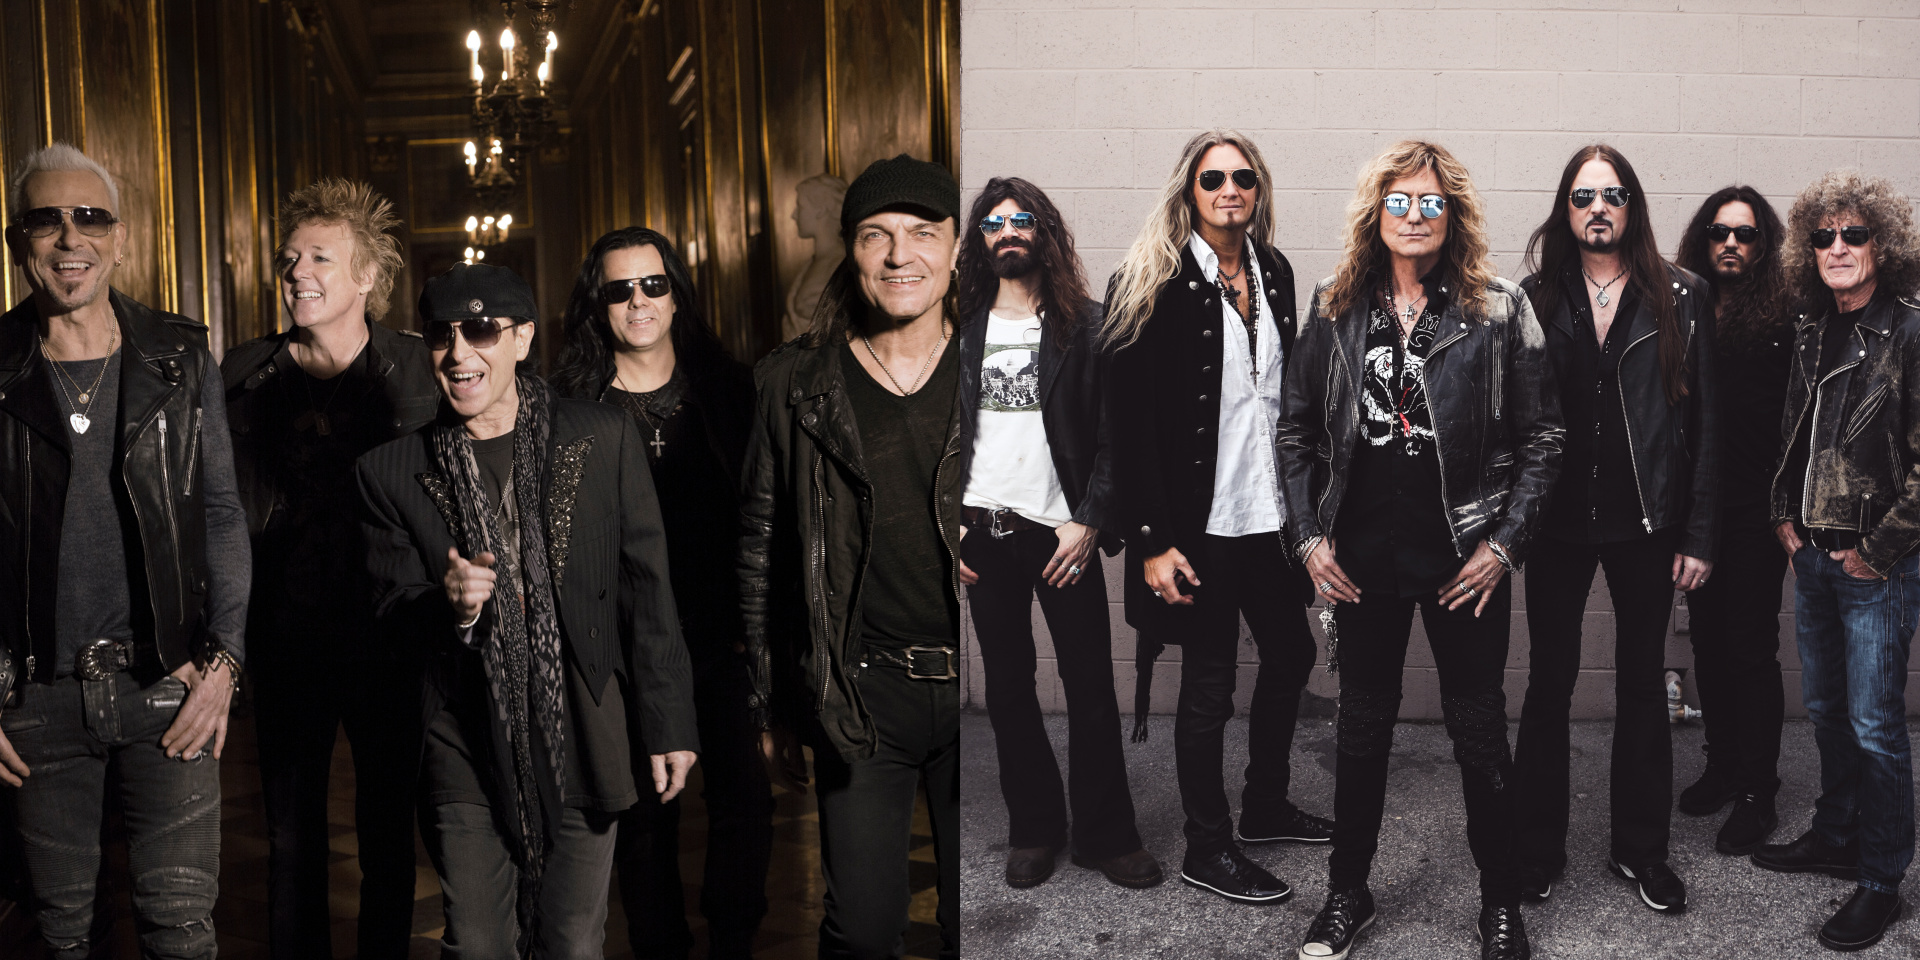 LAMC announces Scorpions and Whitesnake to headline Singapore Rockfest II